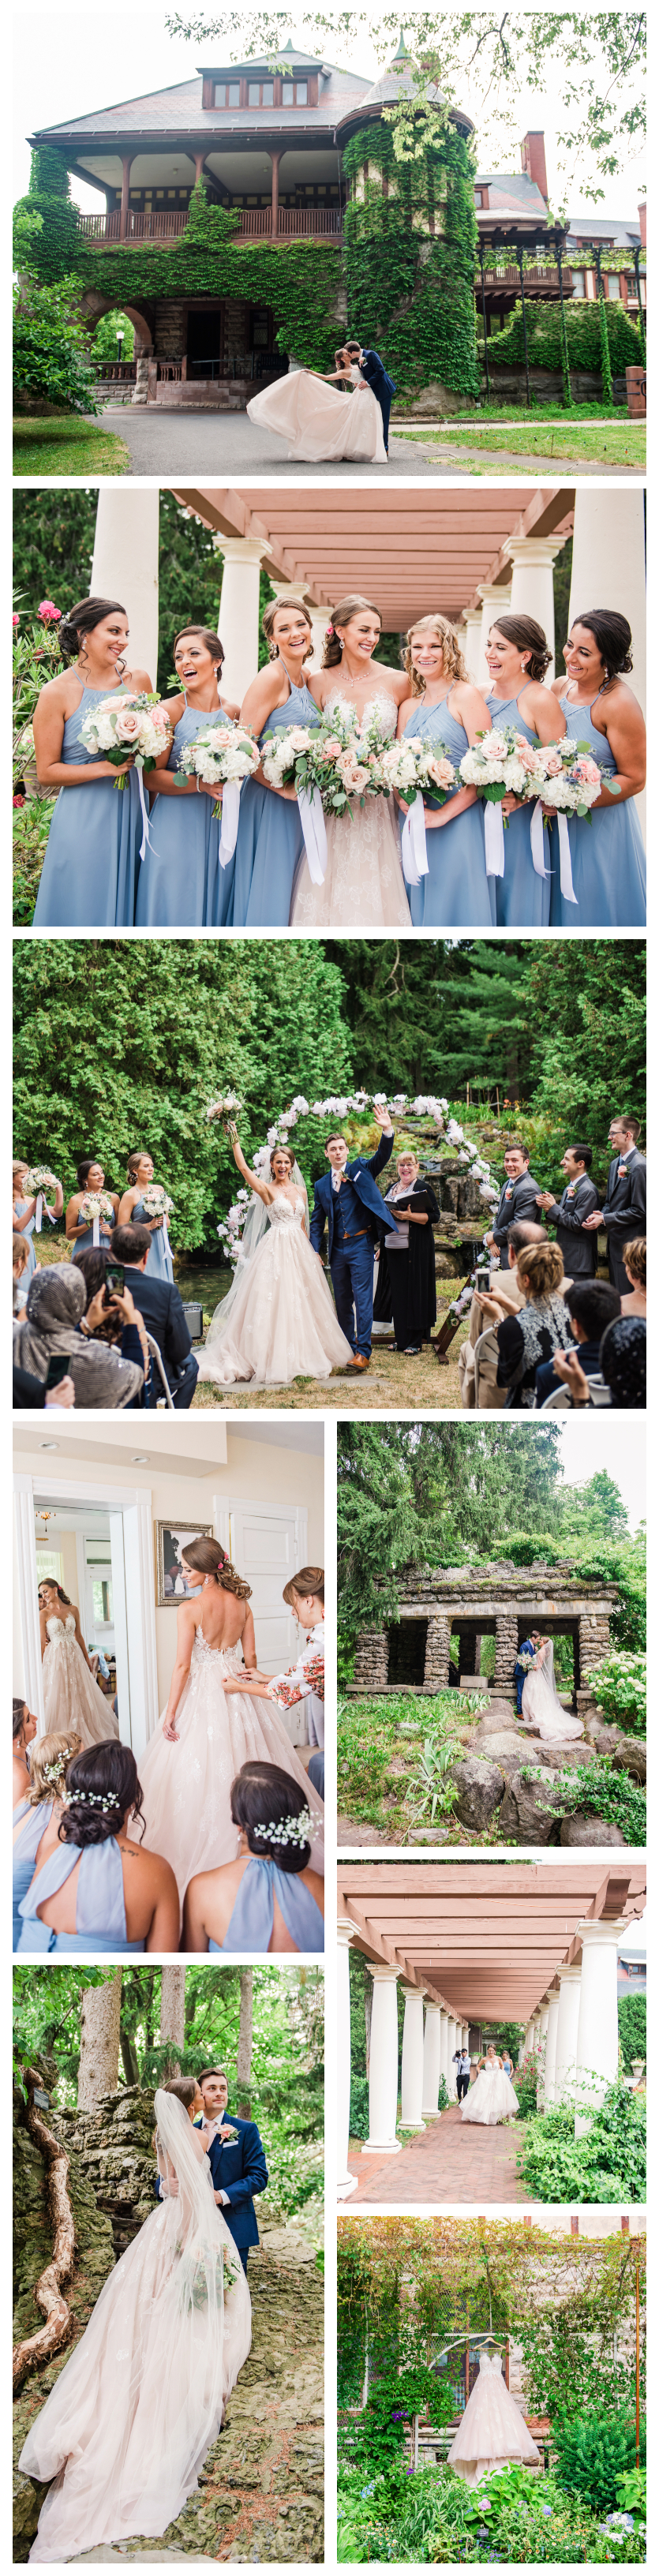 Sonnenberg_Gardens_Rochester_Wedding_JILL_STUDIO_1 (1).jpg